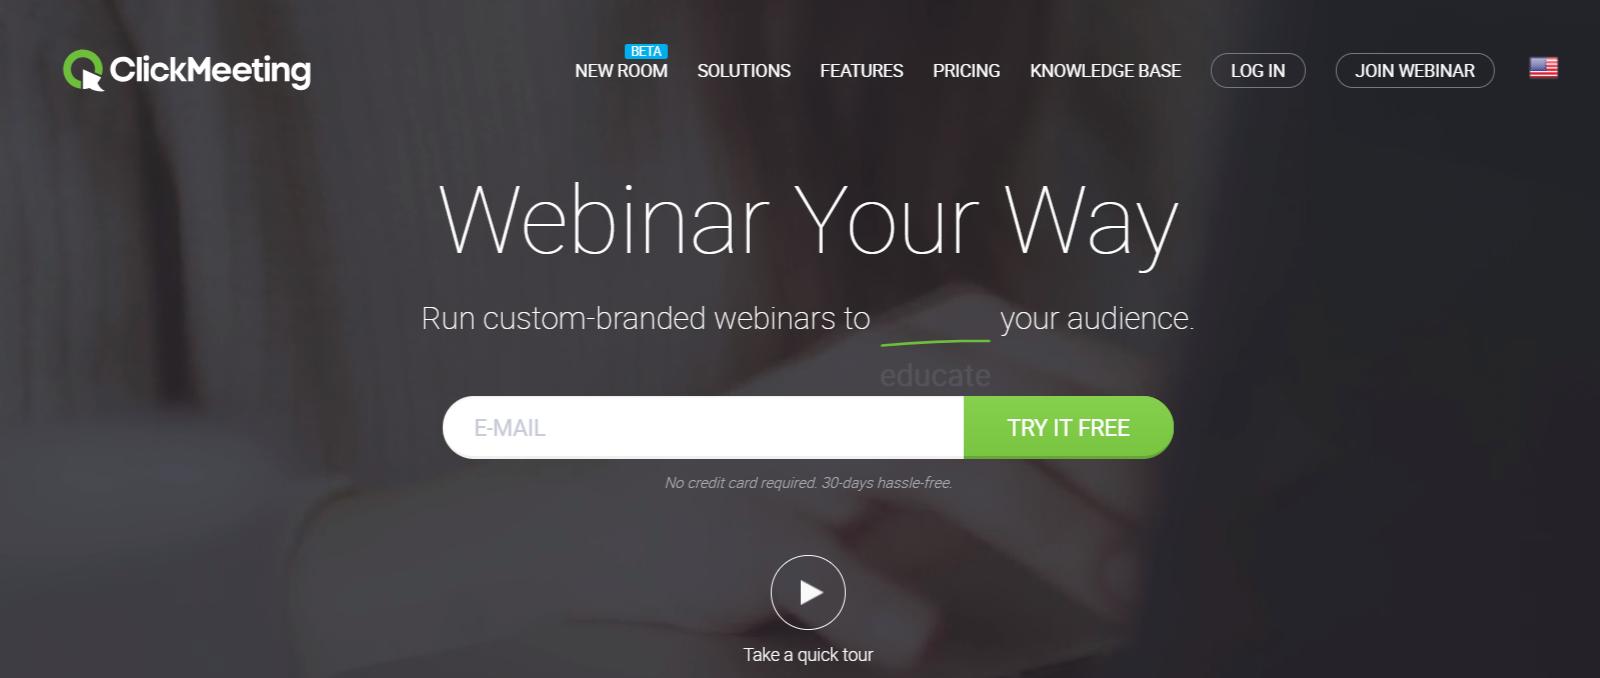 ClickMeeting Review- The Best Webinar Software